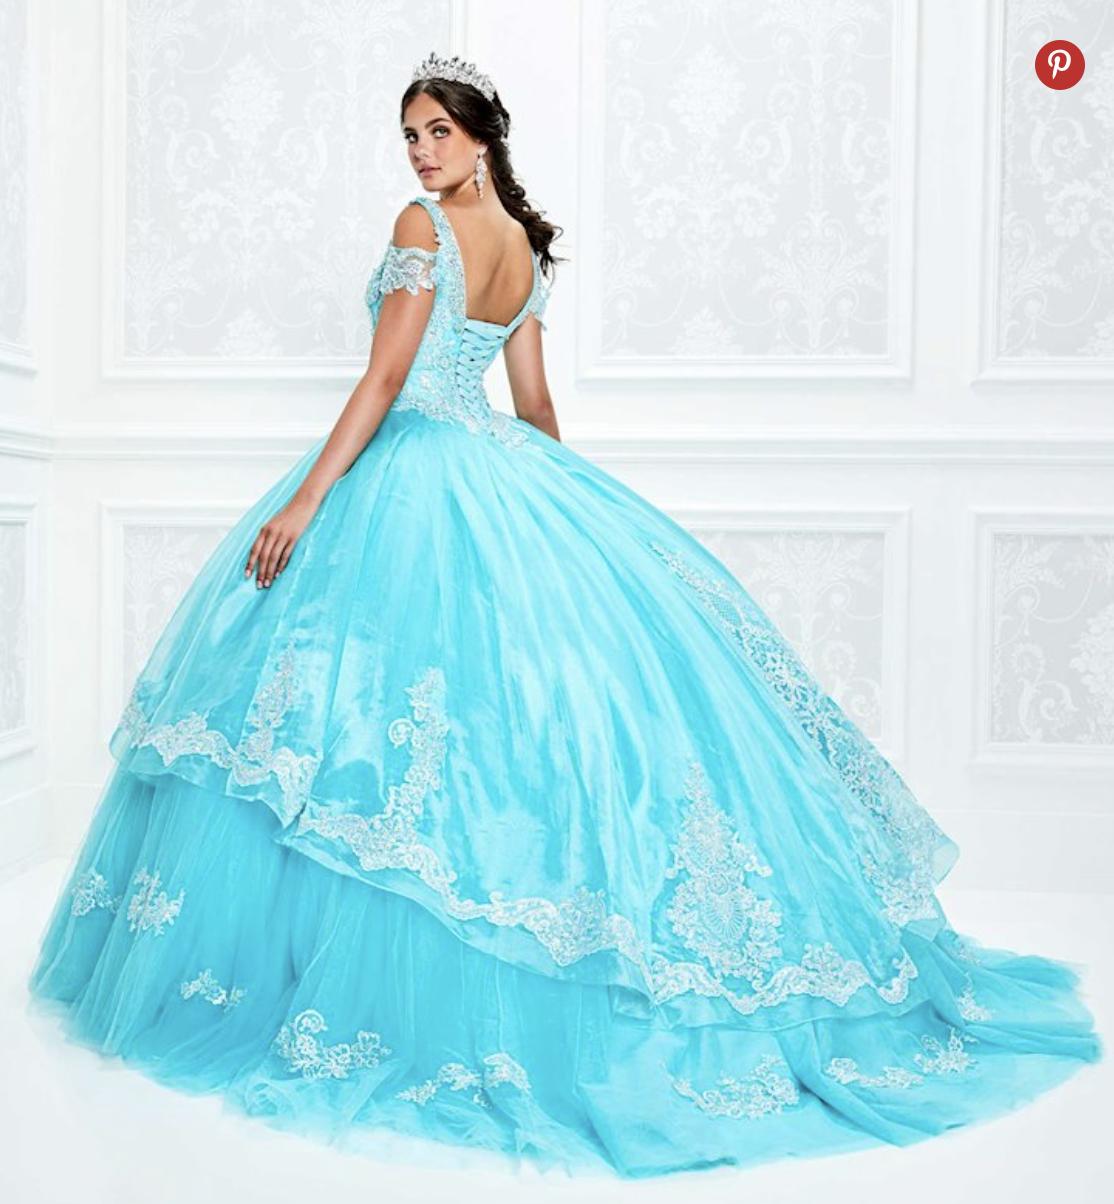 Princesa By Ariana Vara PR11931